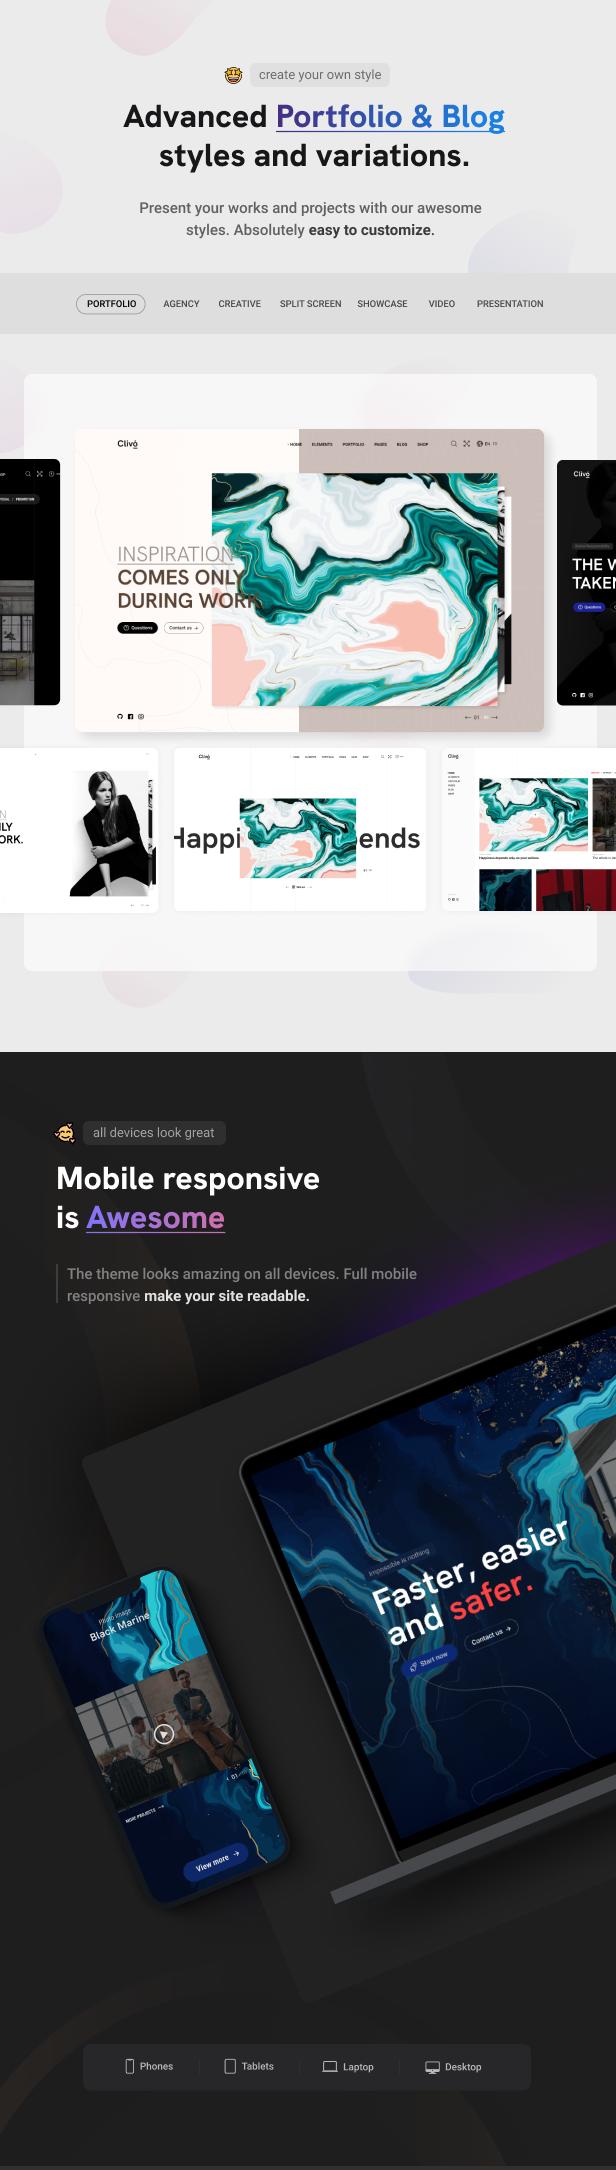 Clivo - Portfolio & Agency WordPress Theme - 10